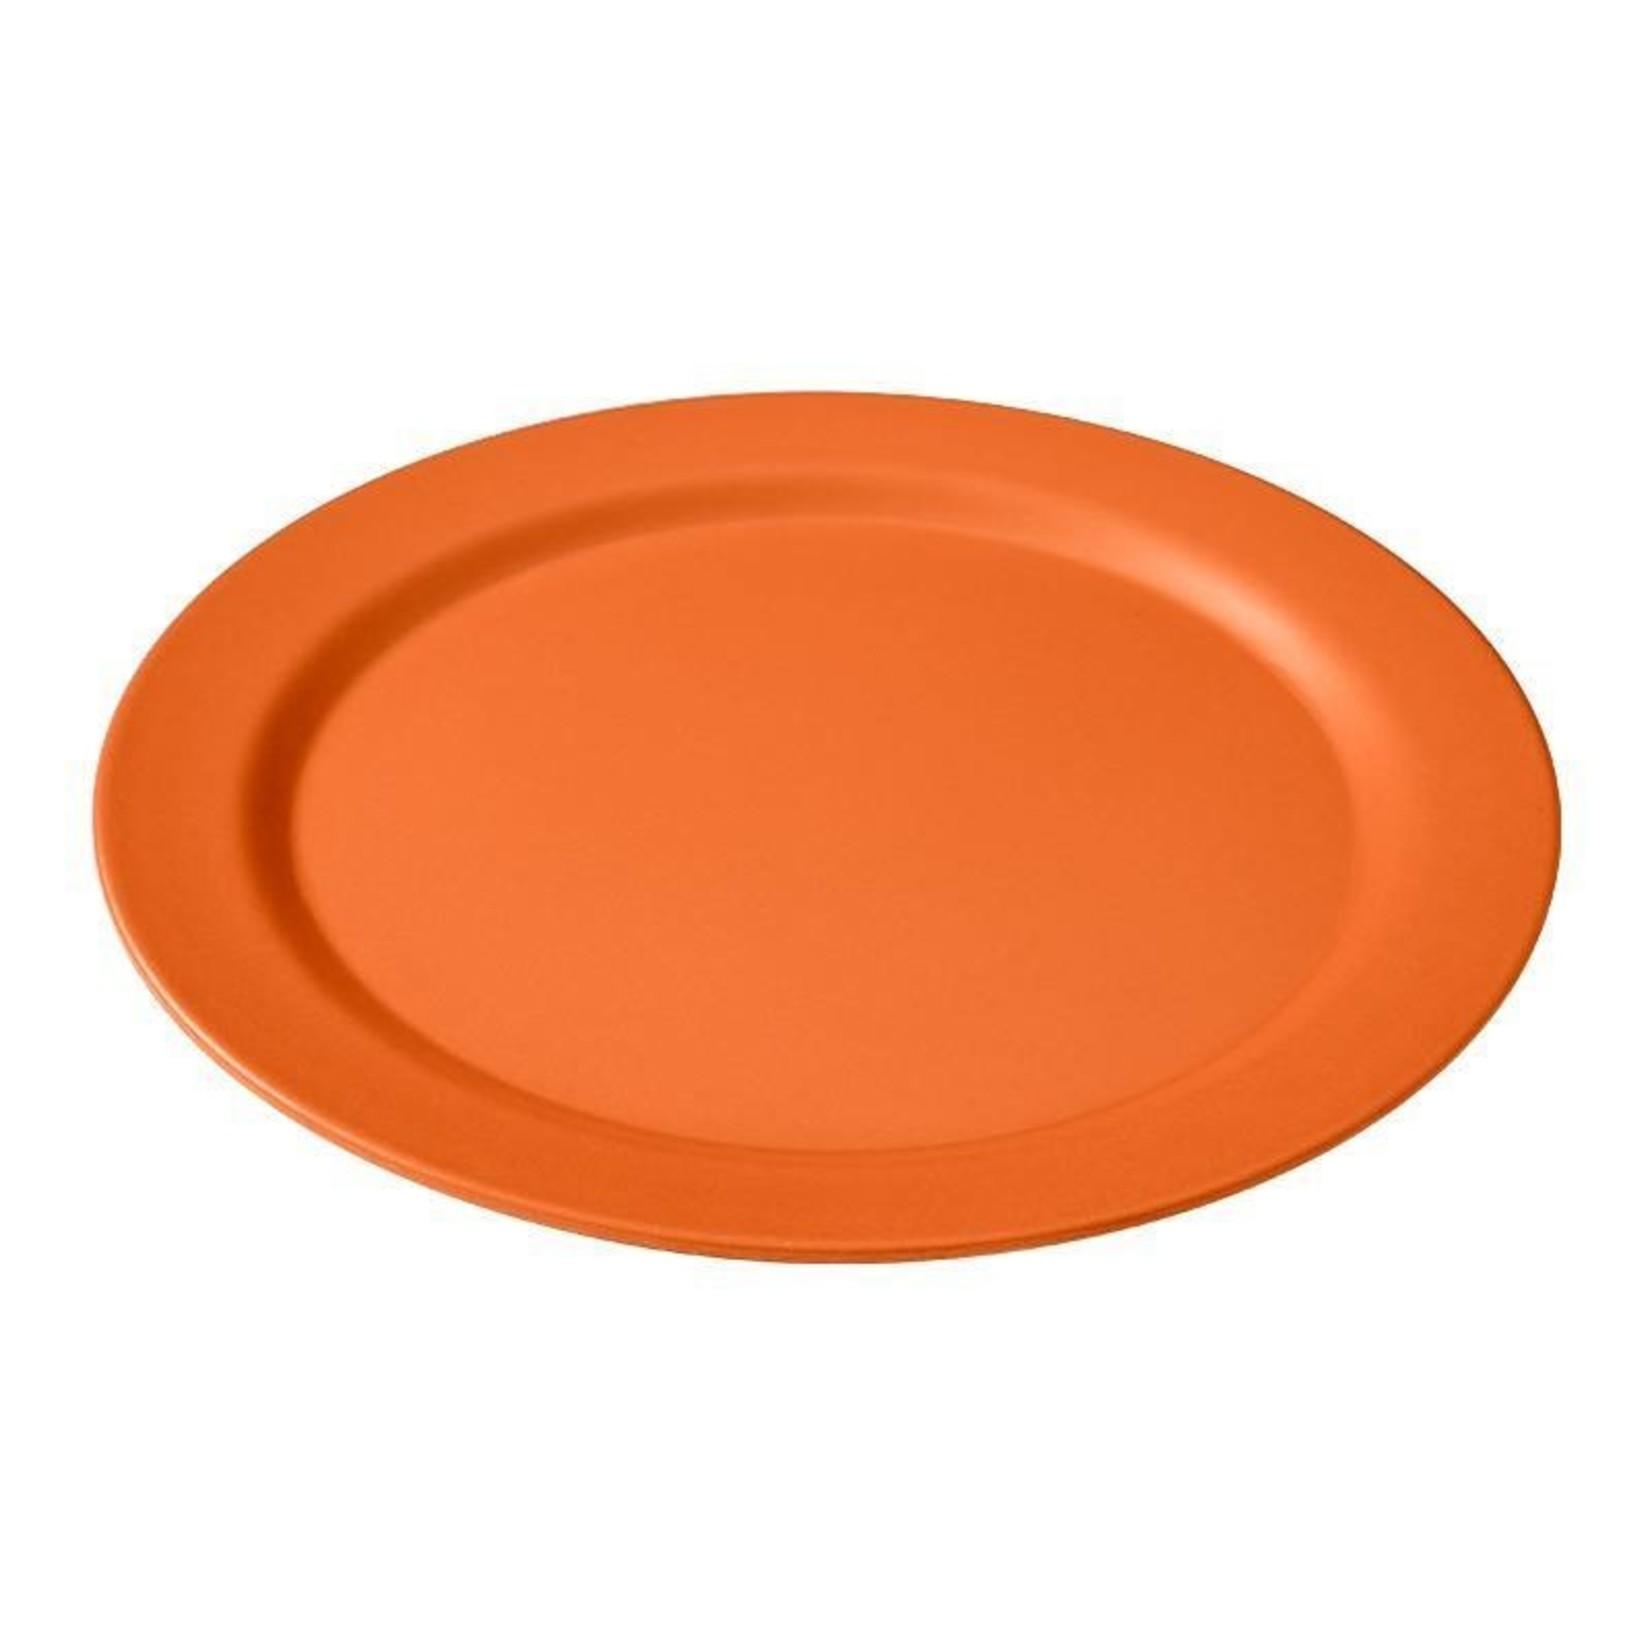 EcoSoulife EcoSoulife Plate 25cm